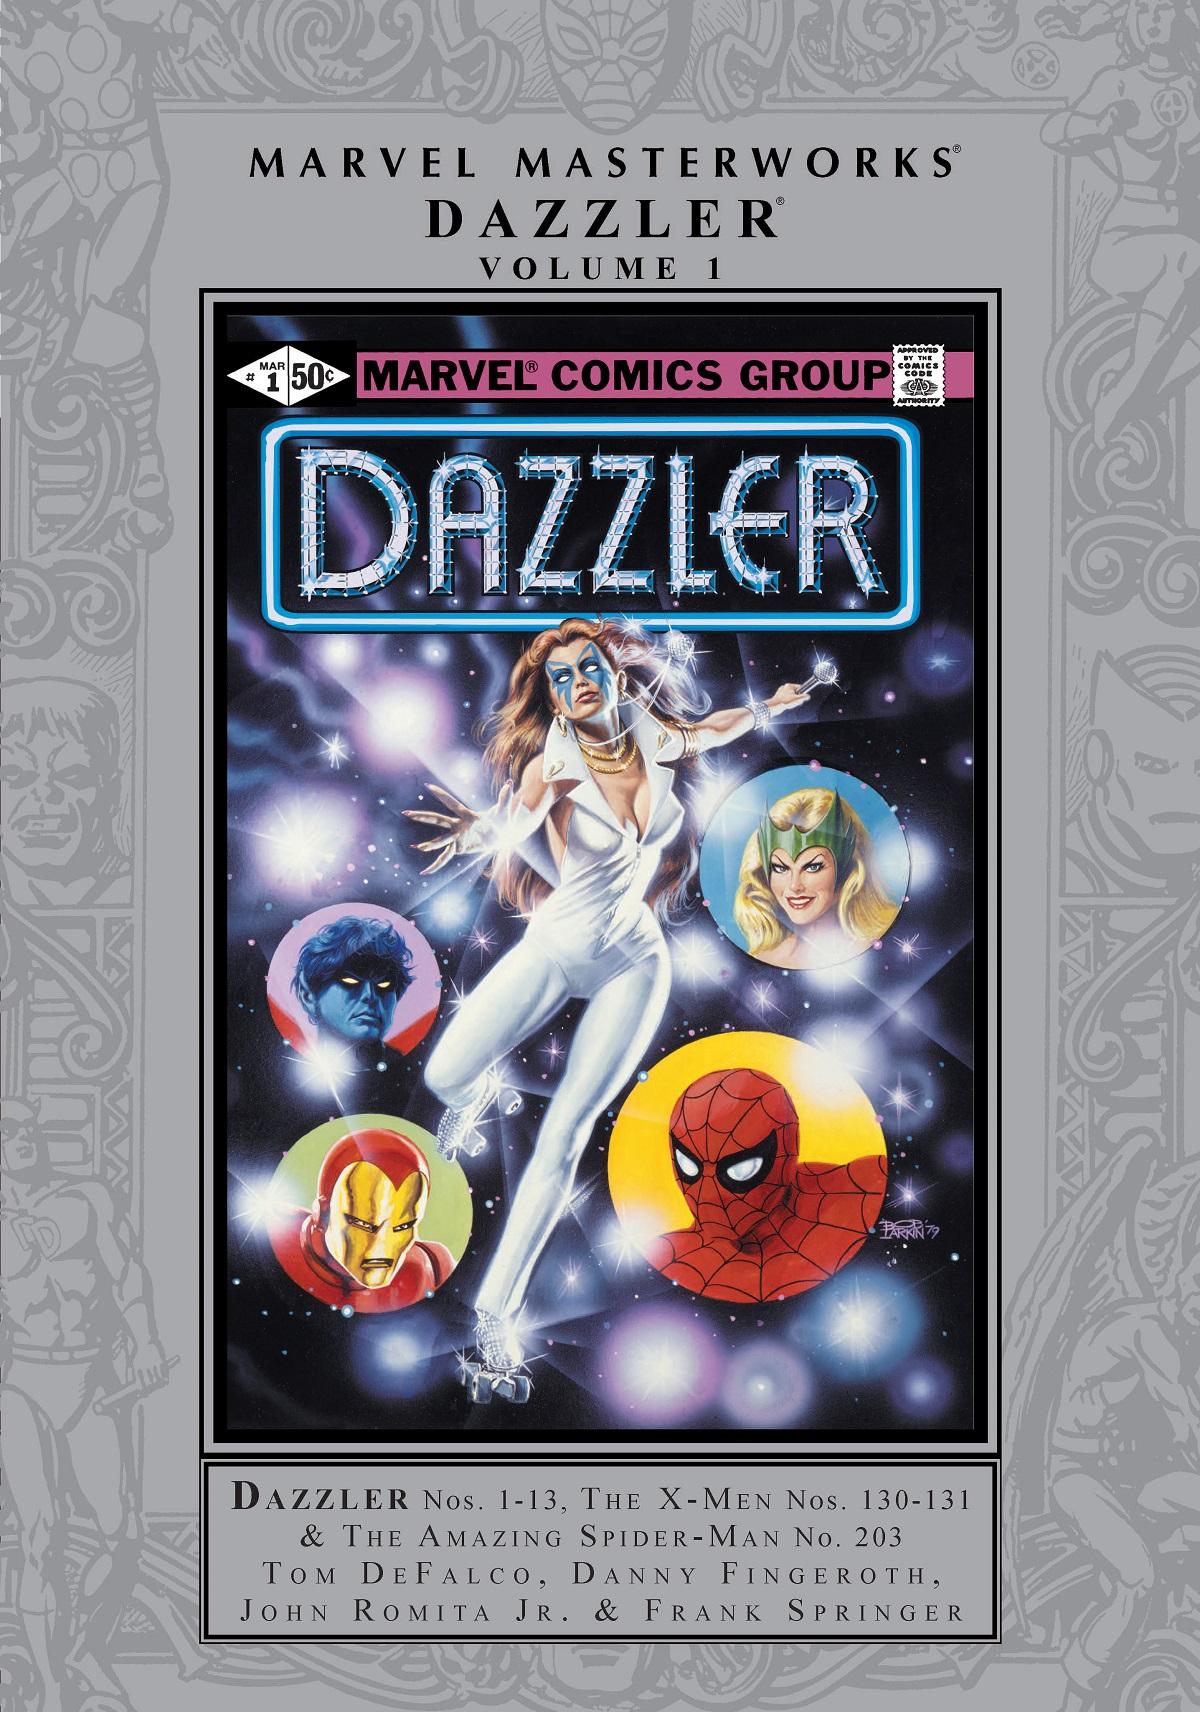 Marvel Masterworks: Dazzler Vol. 1 (Hardcover)